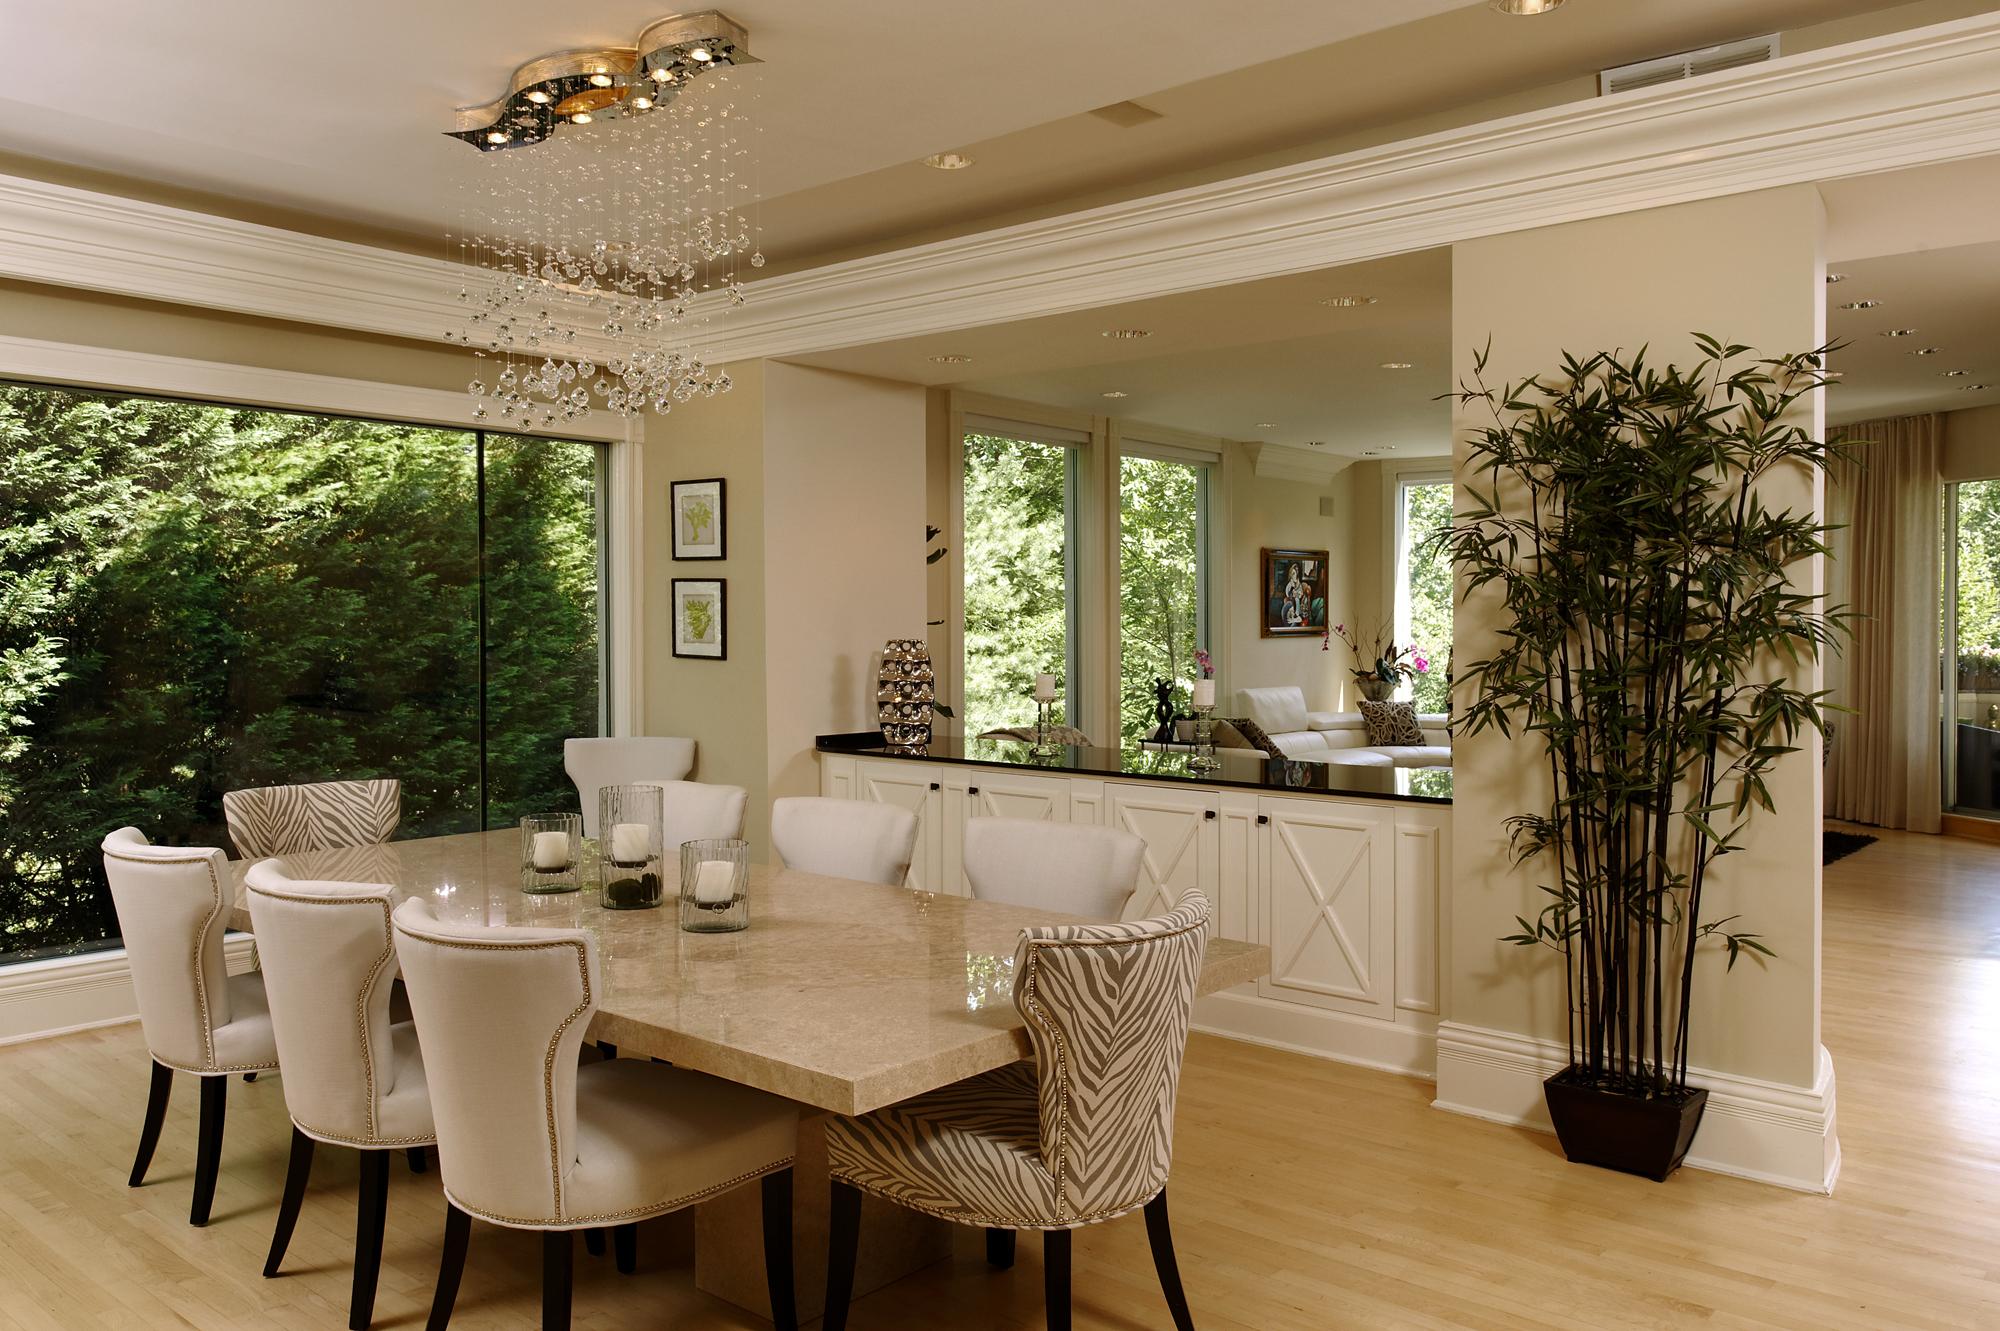 washington dc contemporary interior renovation dining room - Dining Room Renovation Ideas